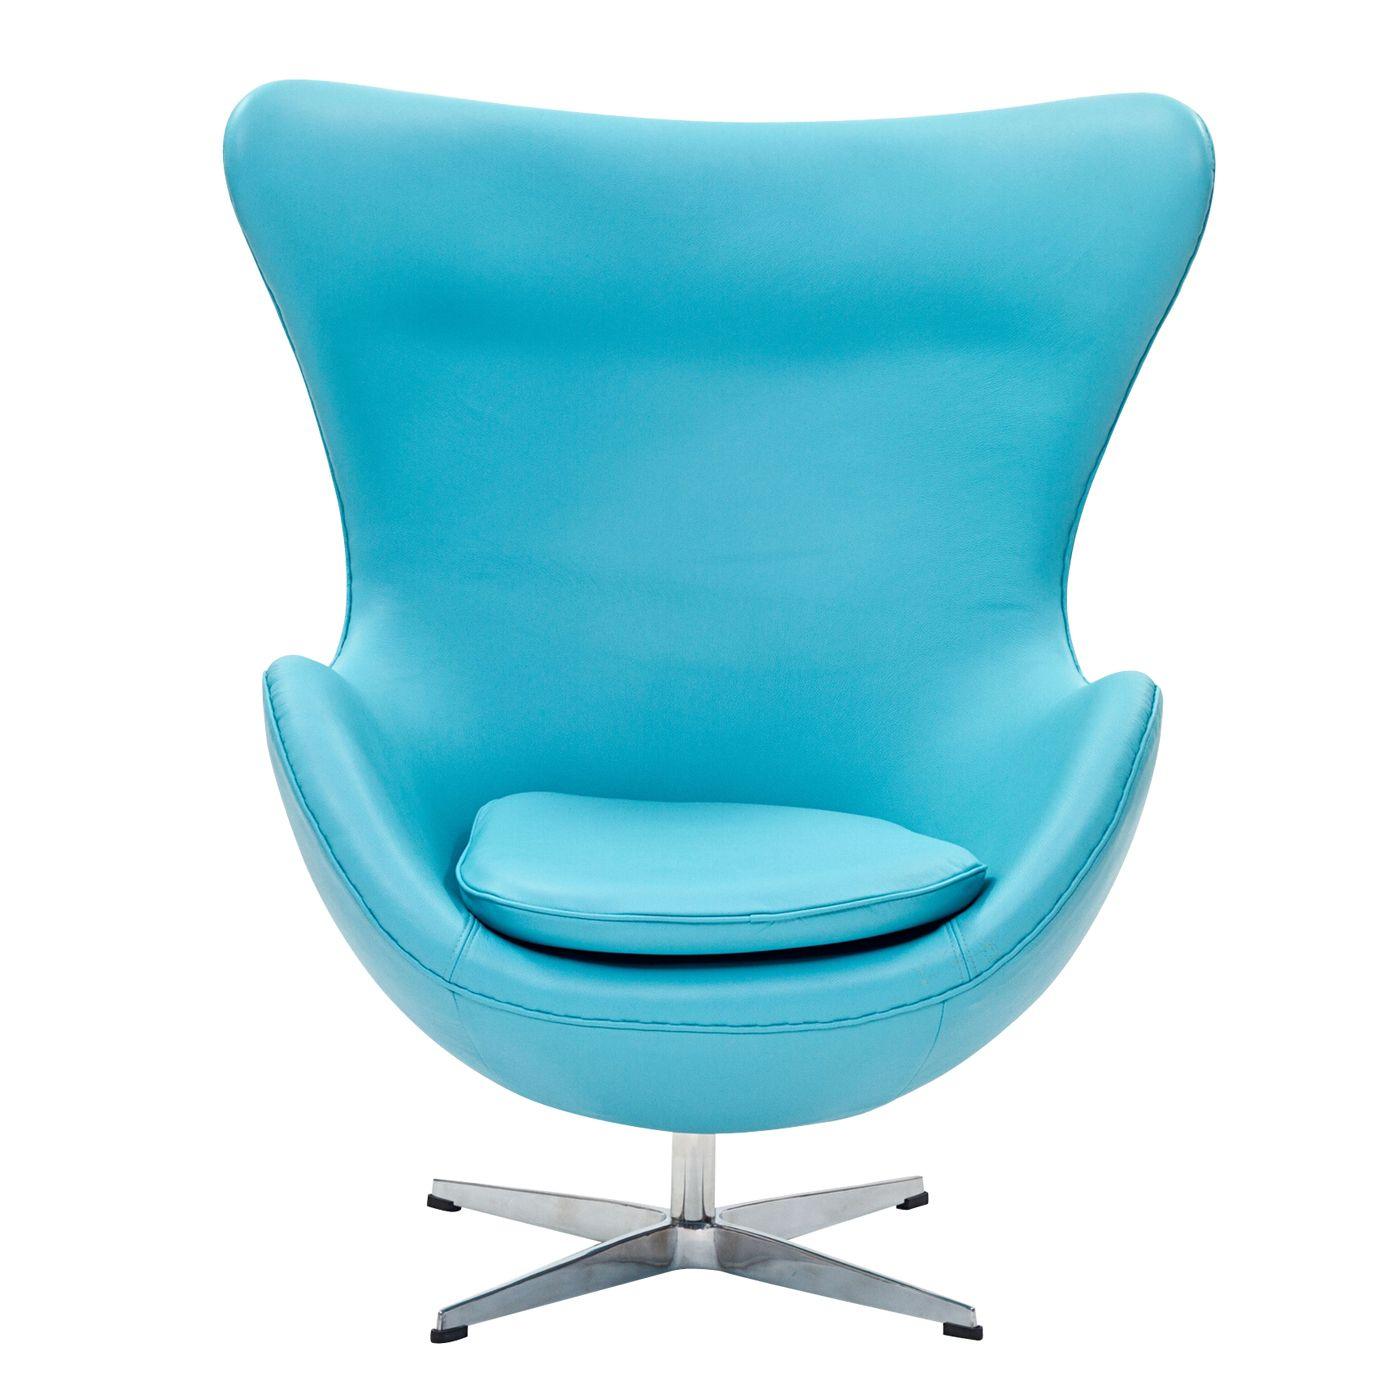 Best Modway Eei Glove Lounge Chair Atg Stores Blue Accent 400 x 300